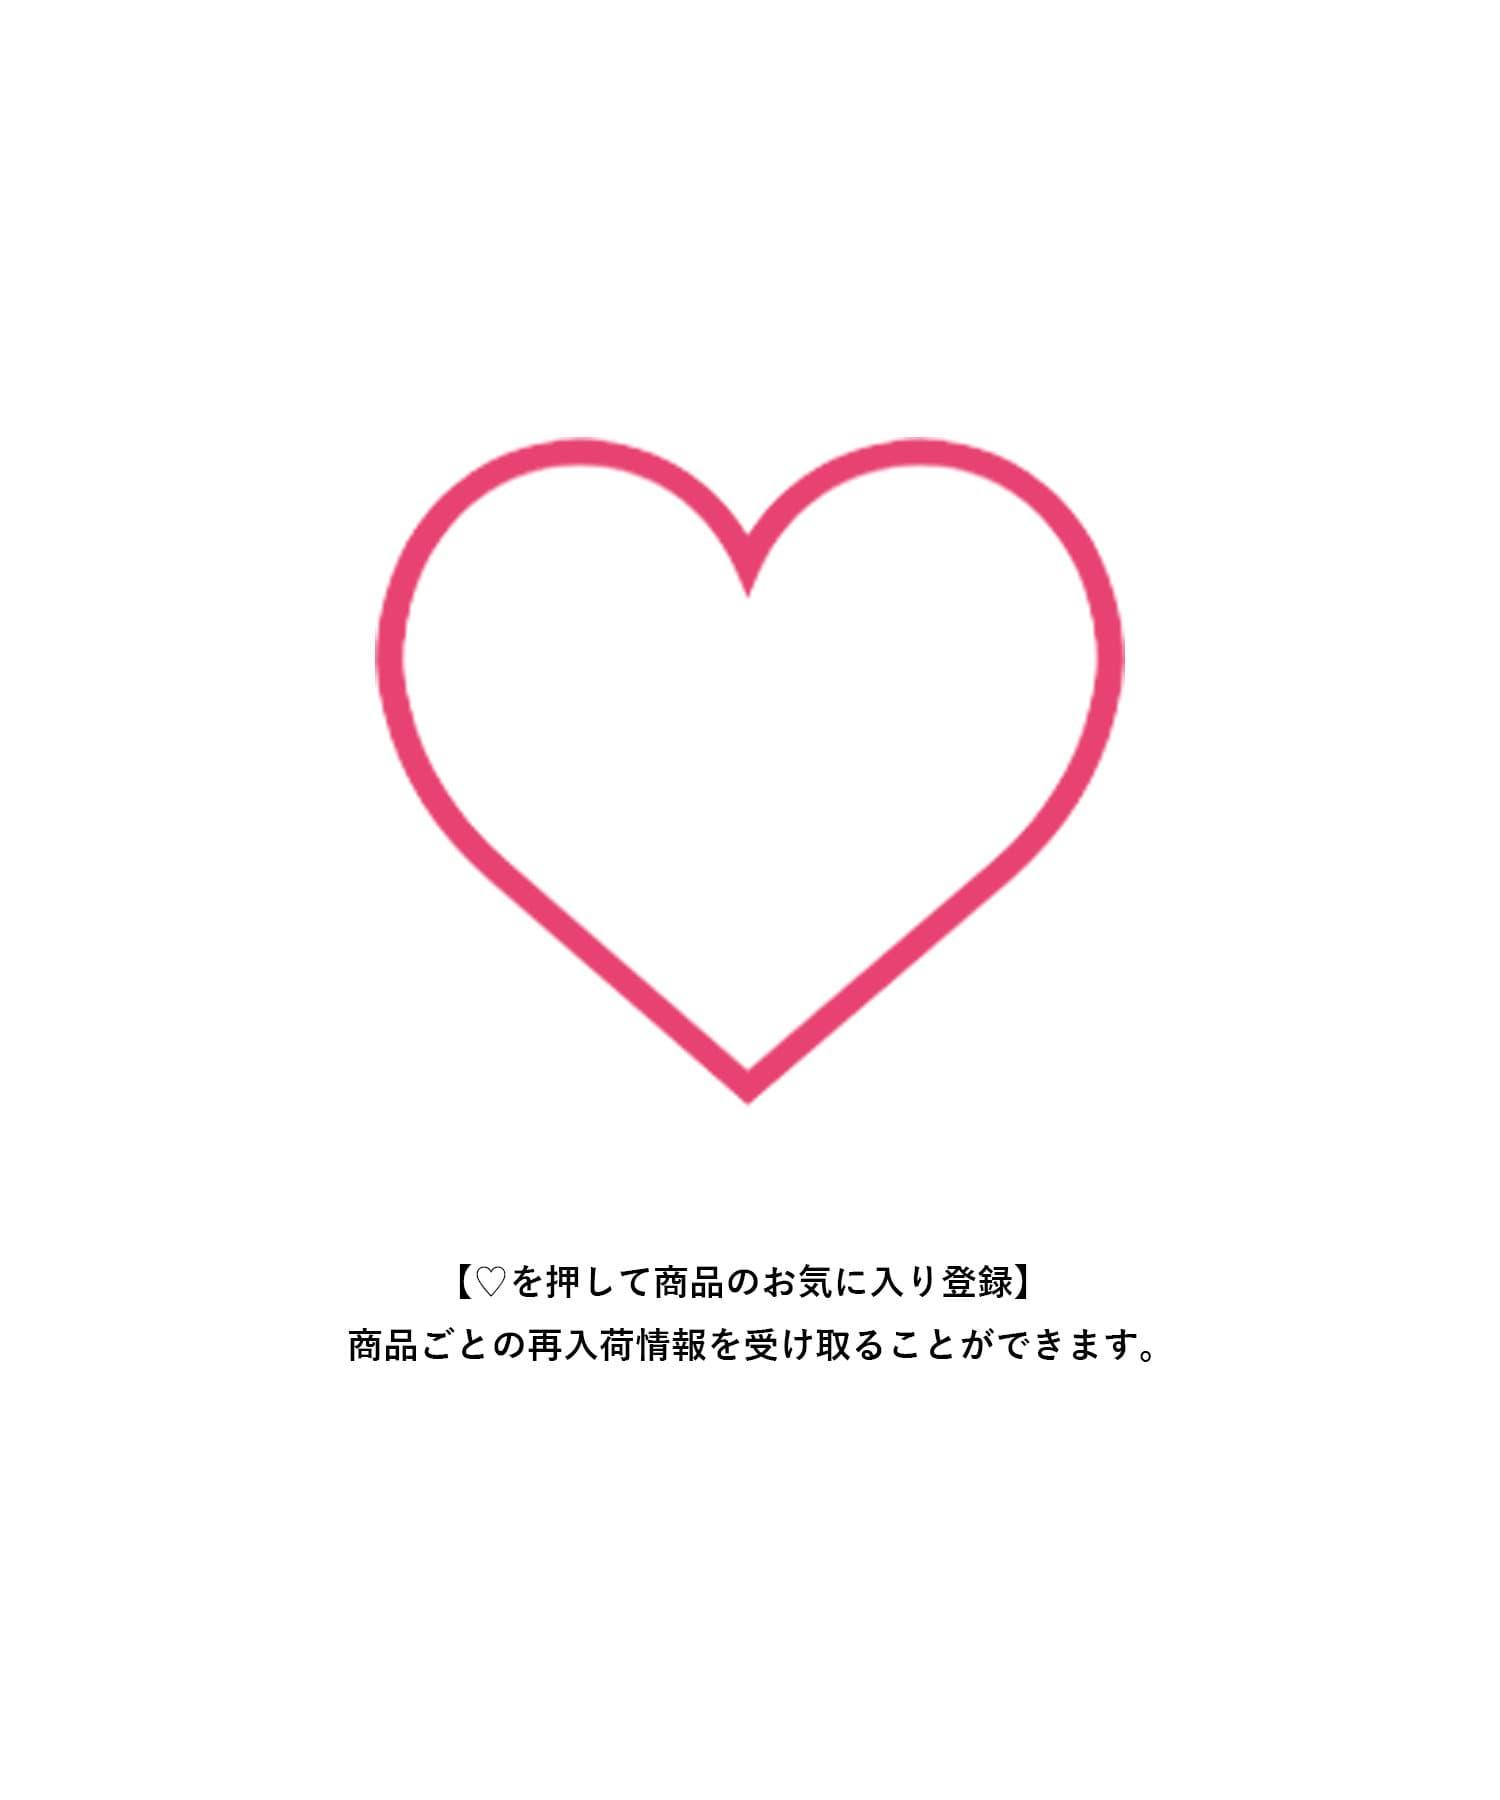 COLLAGE GALLARDAGALANTE(コラージュ ガリャルダガランテ) 【PAPILLONNER】【小物は淑女に】レジン封入フックピアス